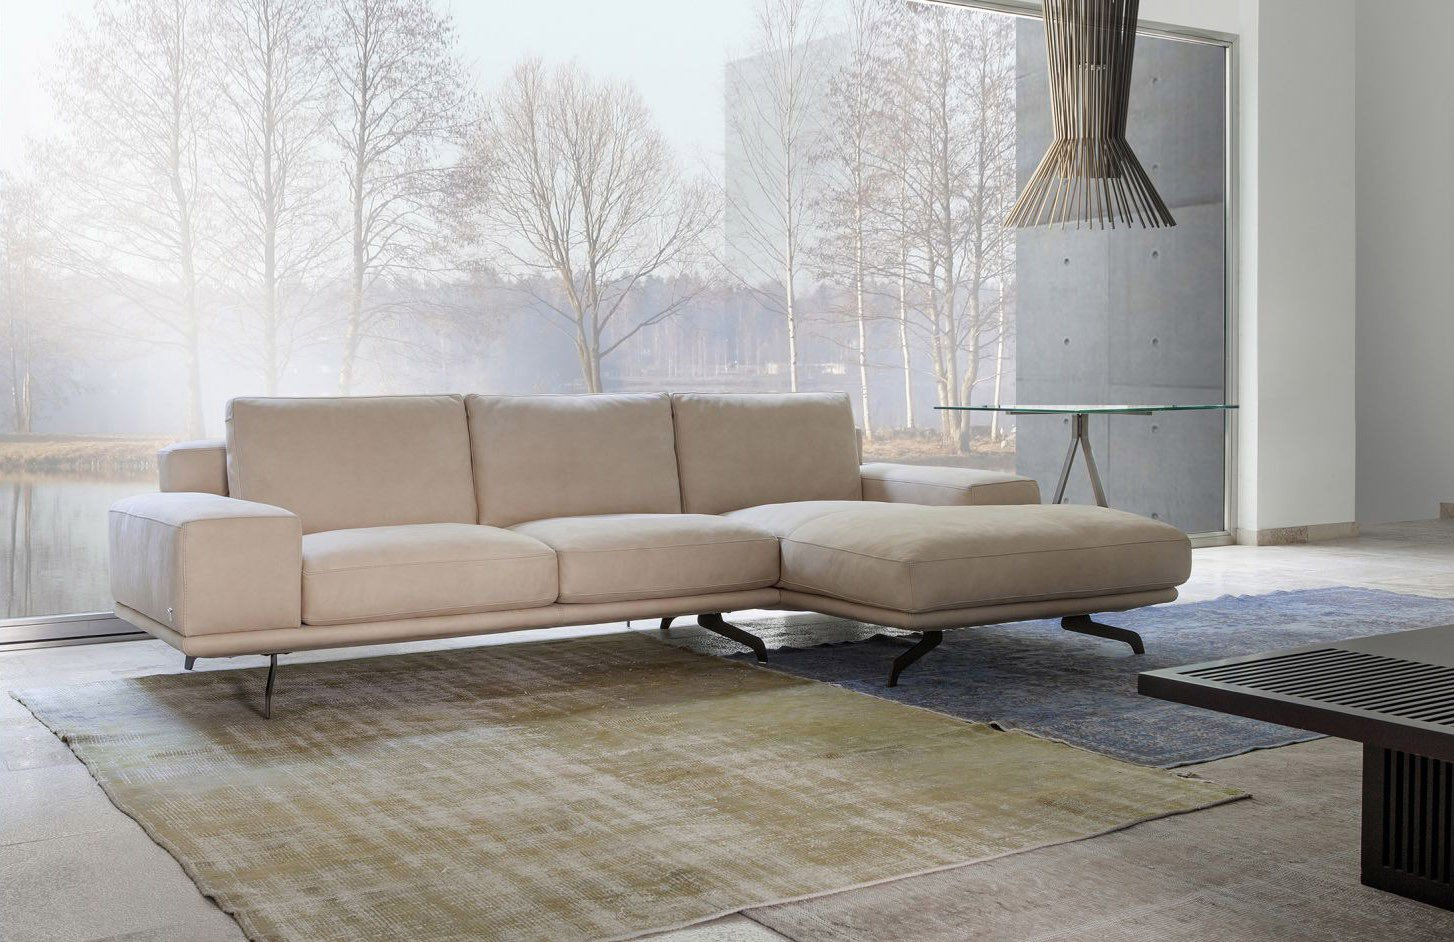 Calia Italia Planet Sofa In Beige Möbel Letz Ihr Online Shop